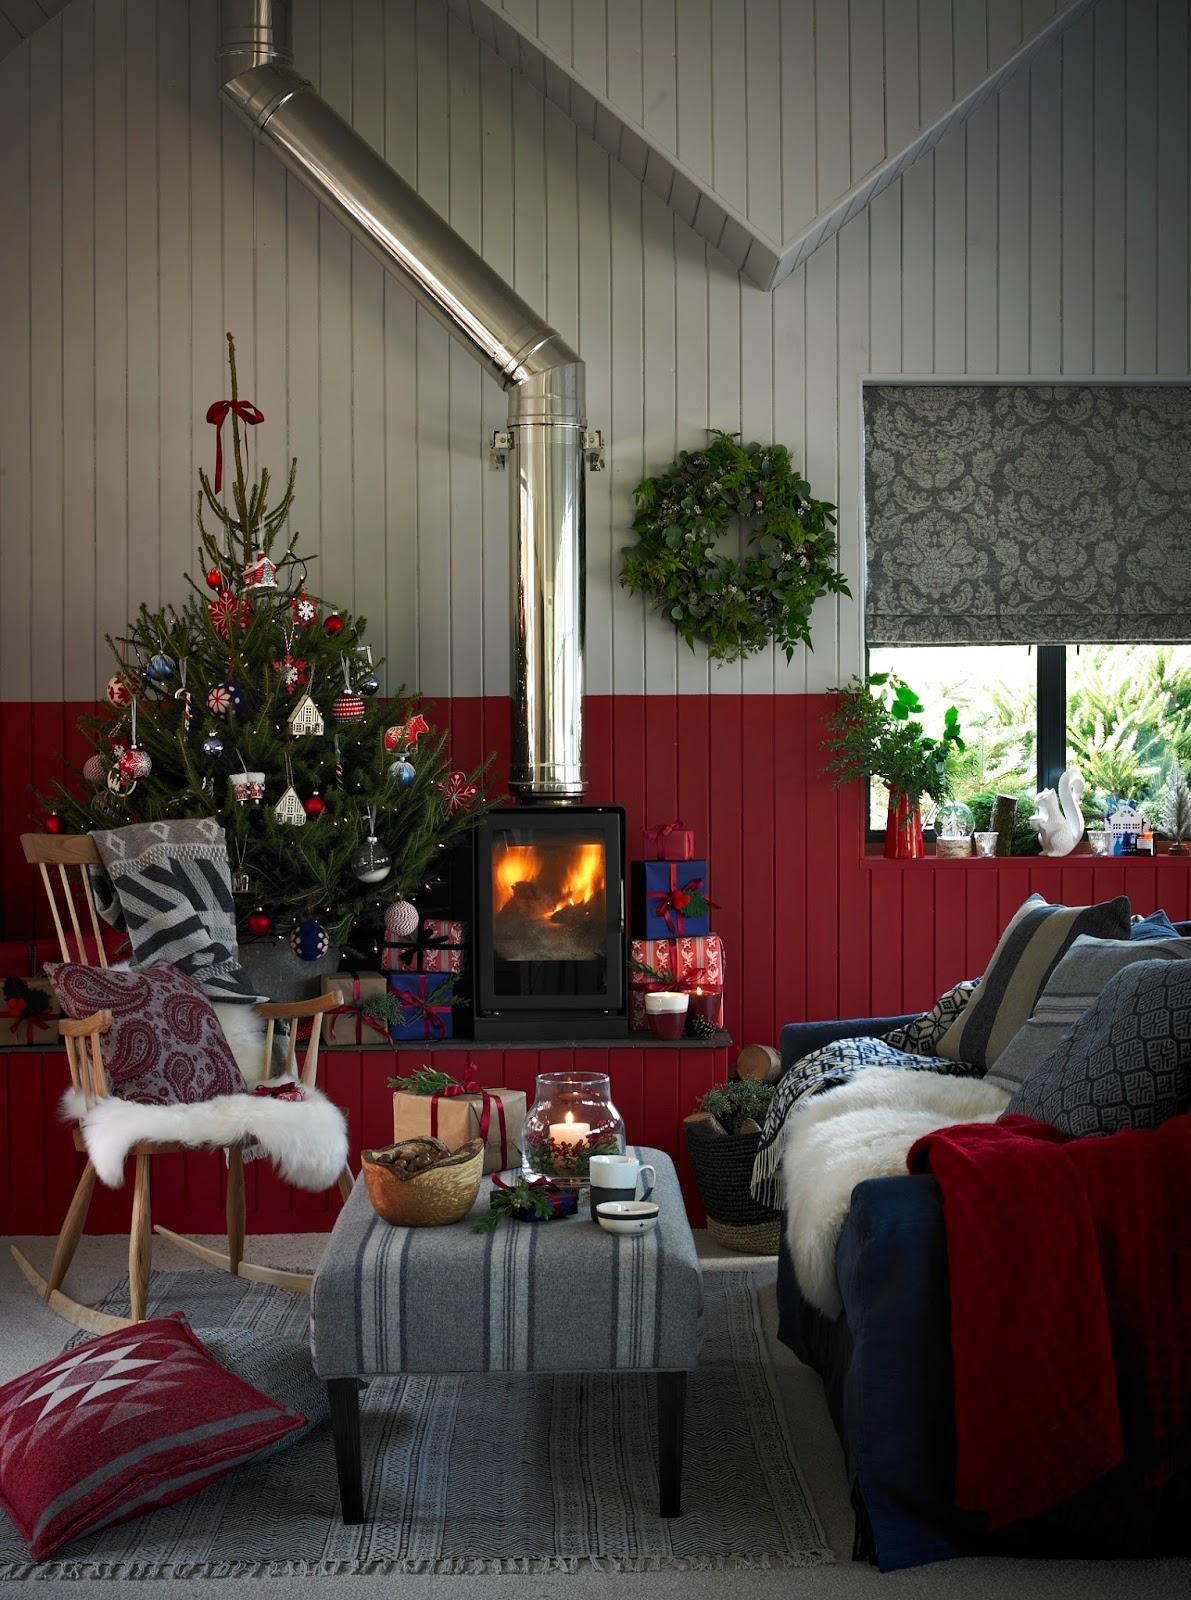 selina lake country homes interior christmas